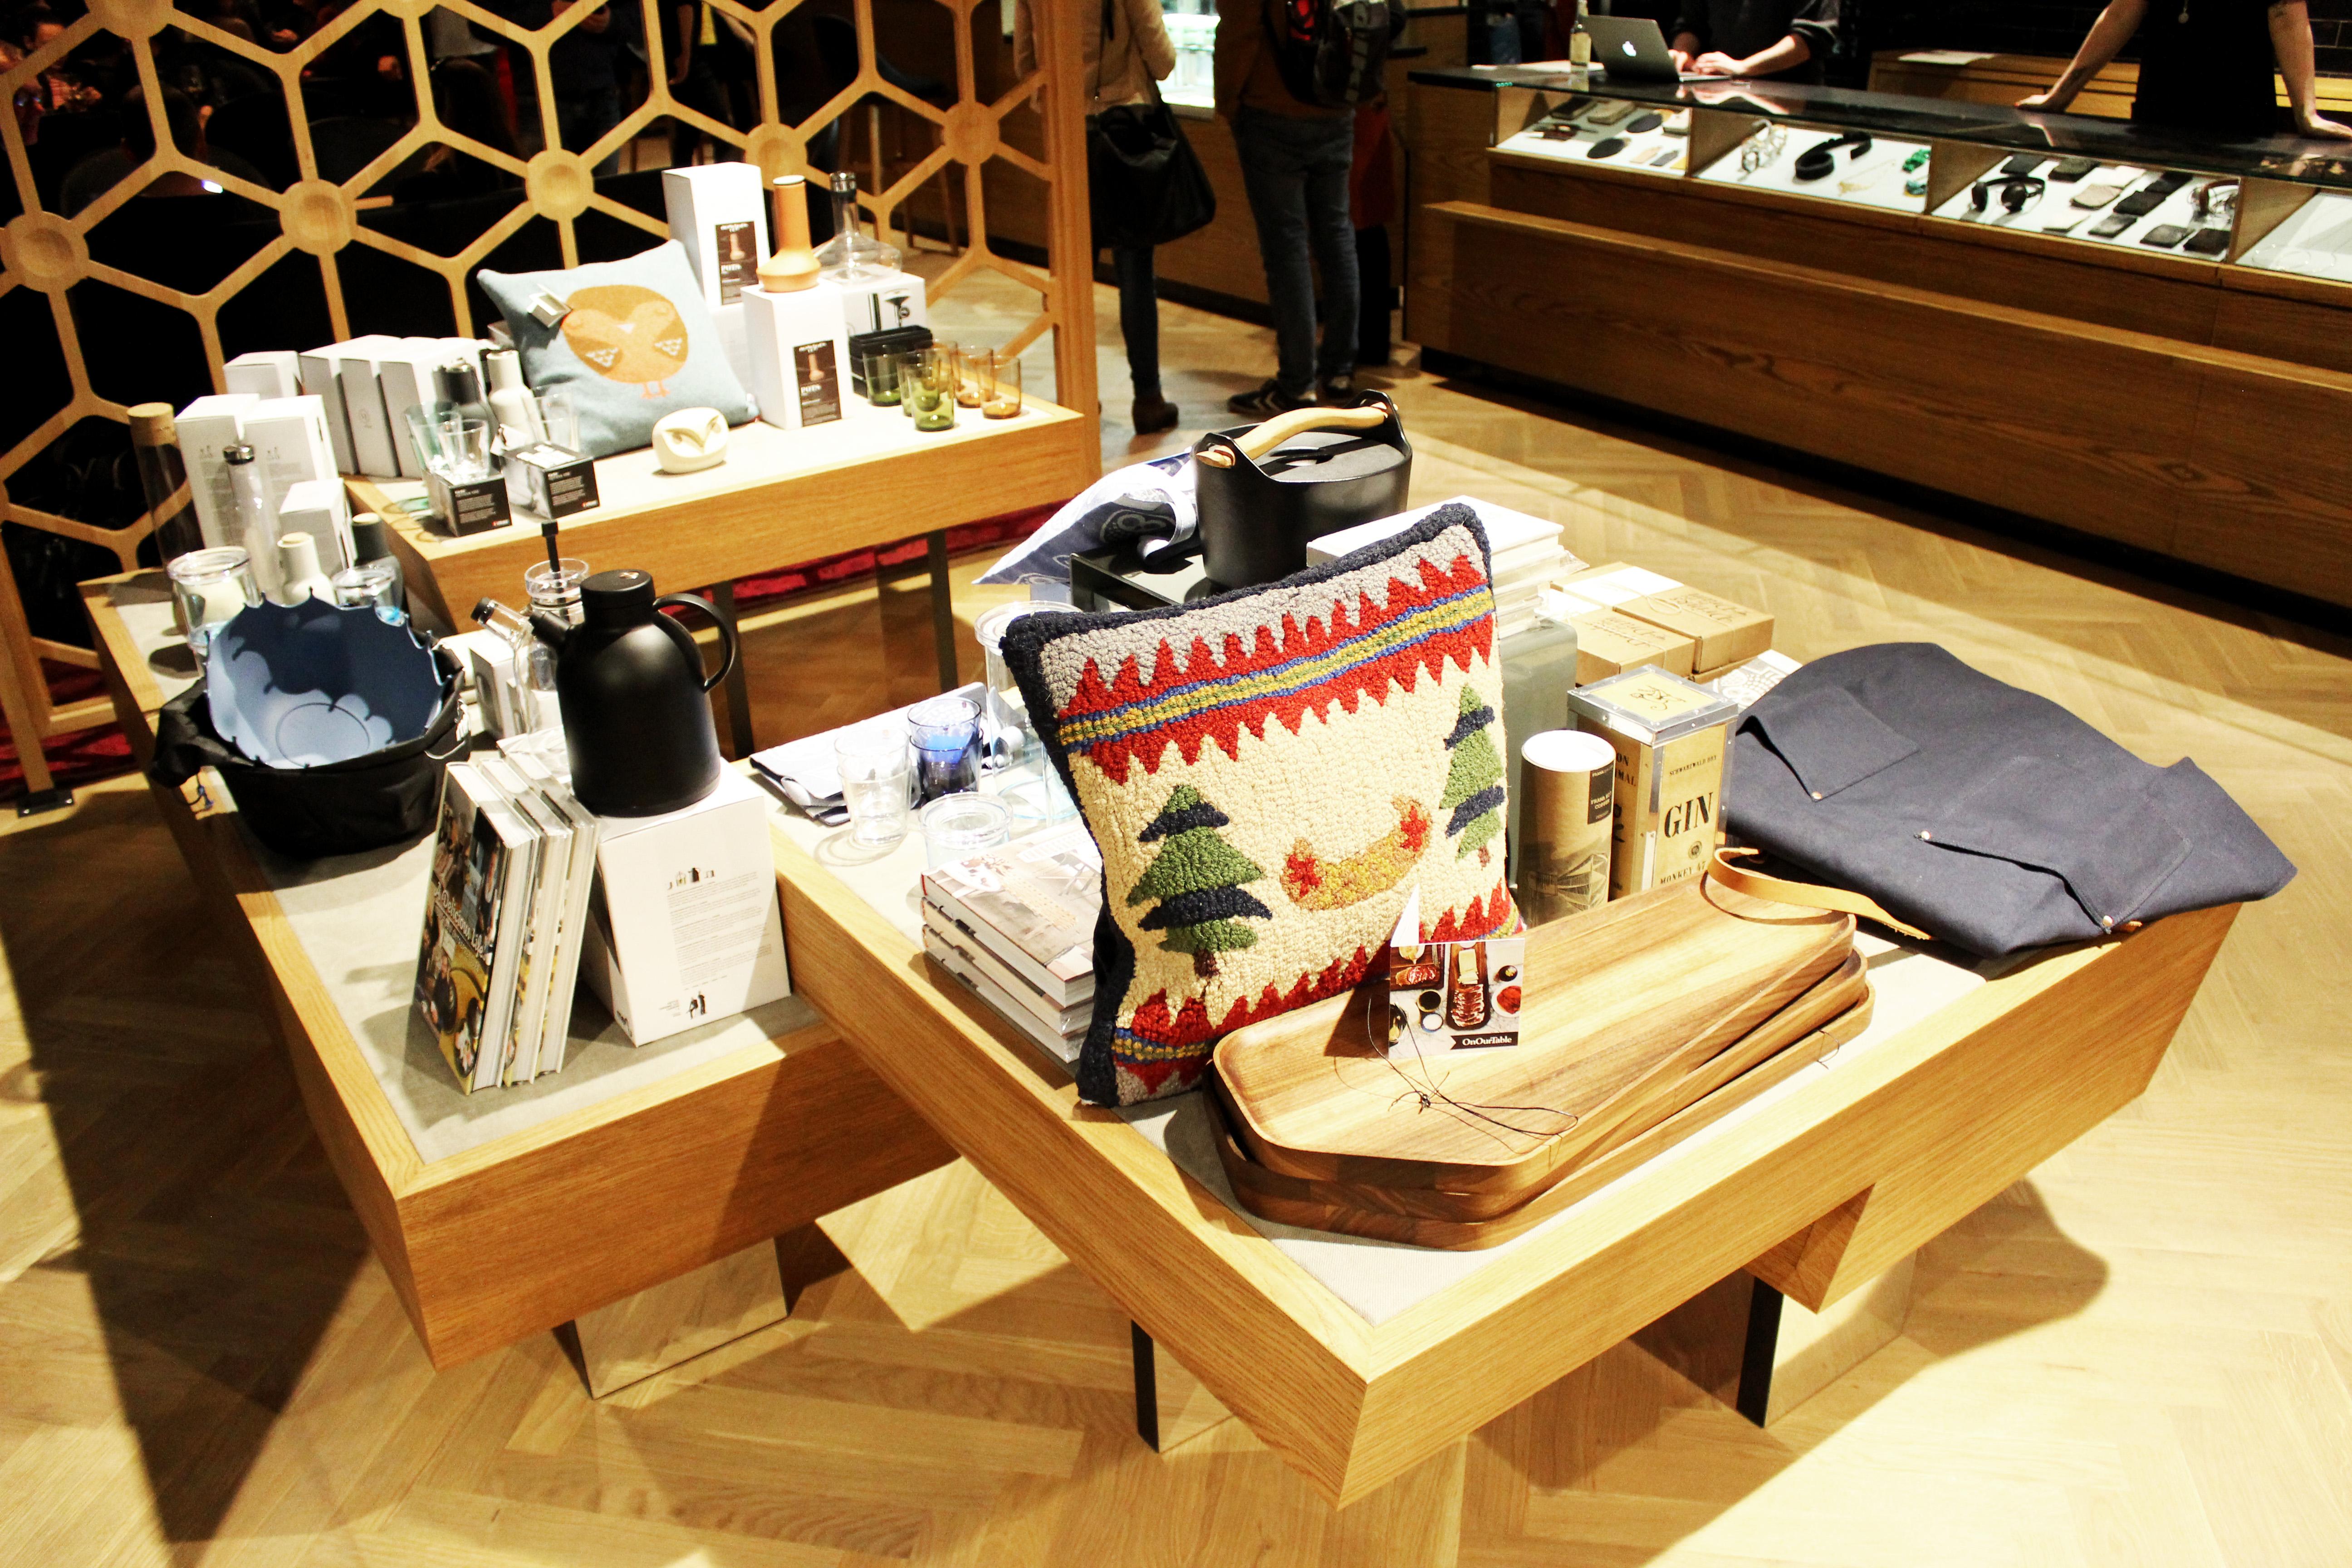 Gestalten Pavilion Store & Cafe